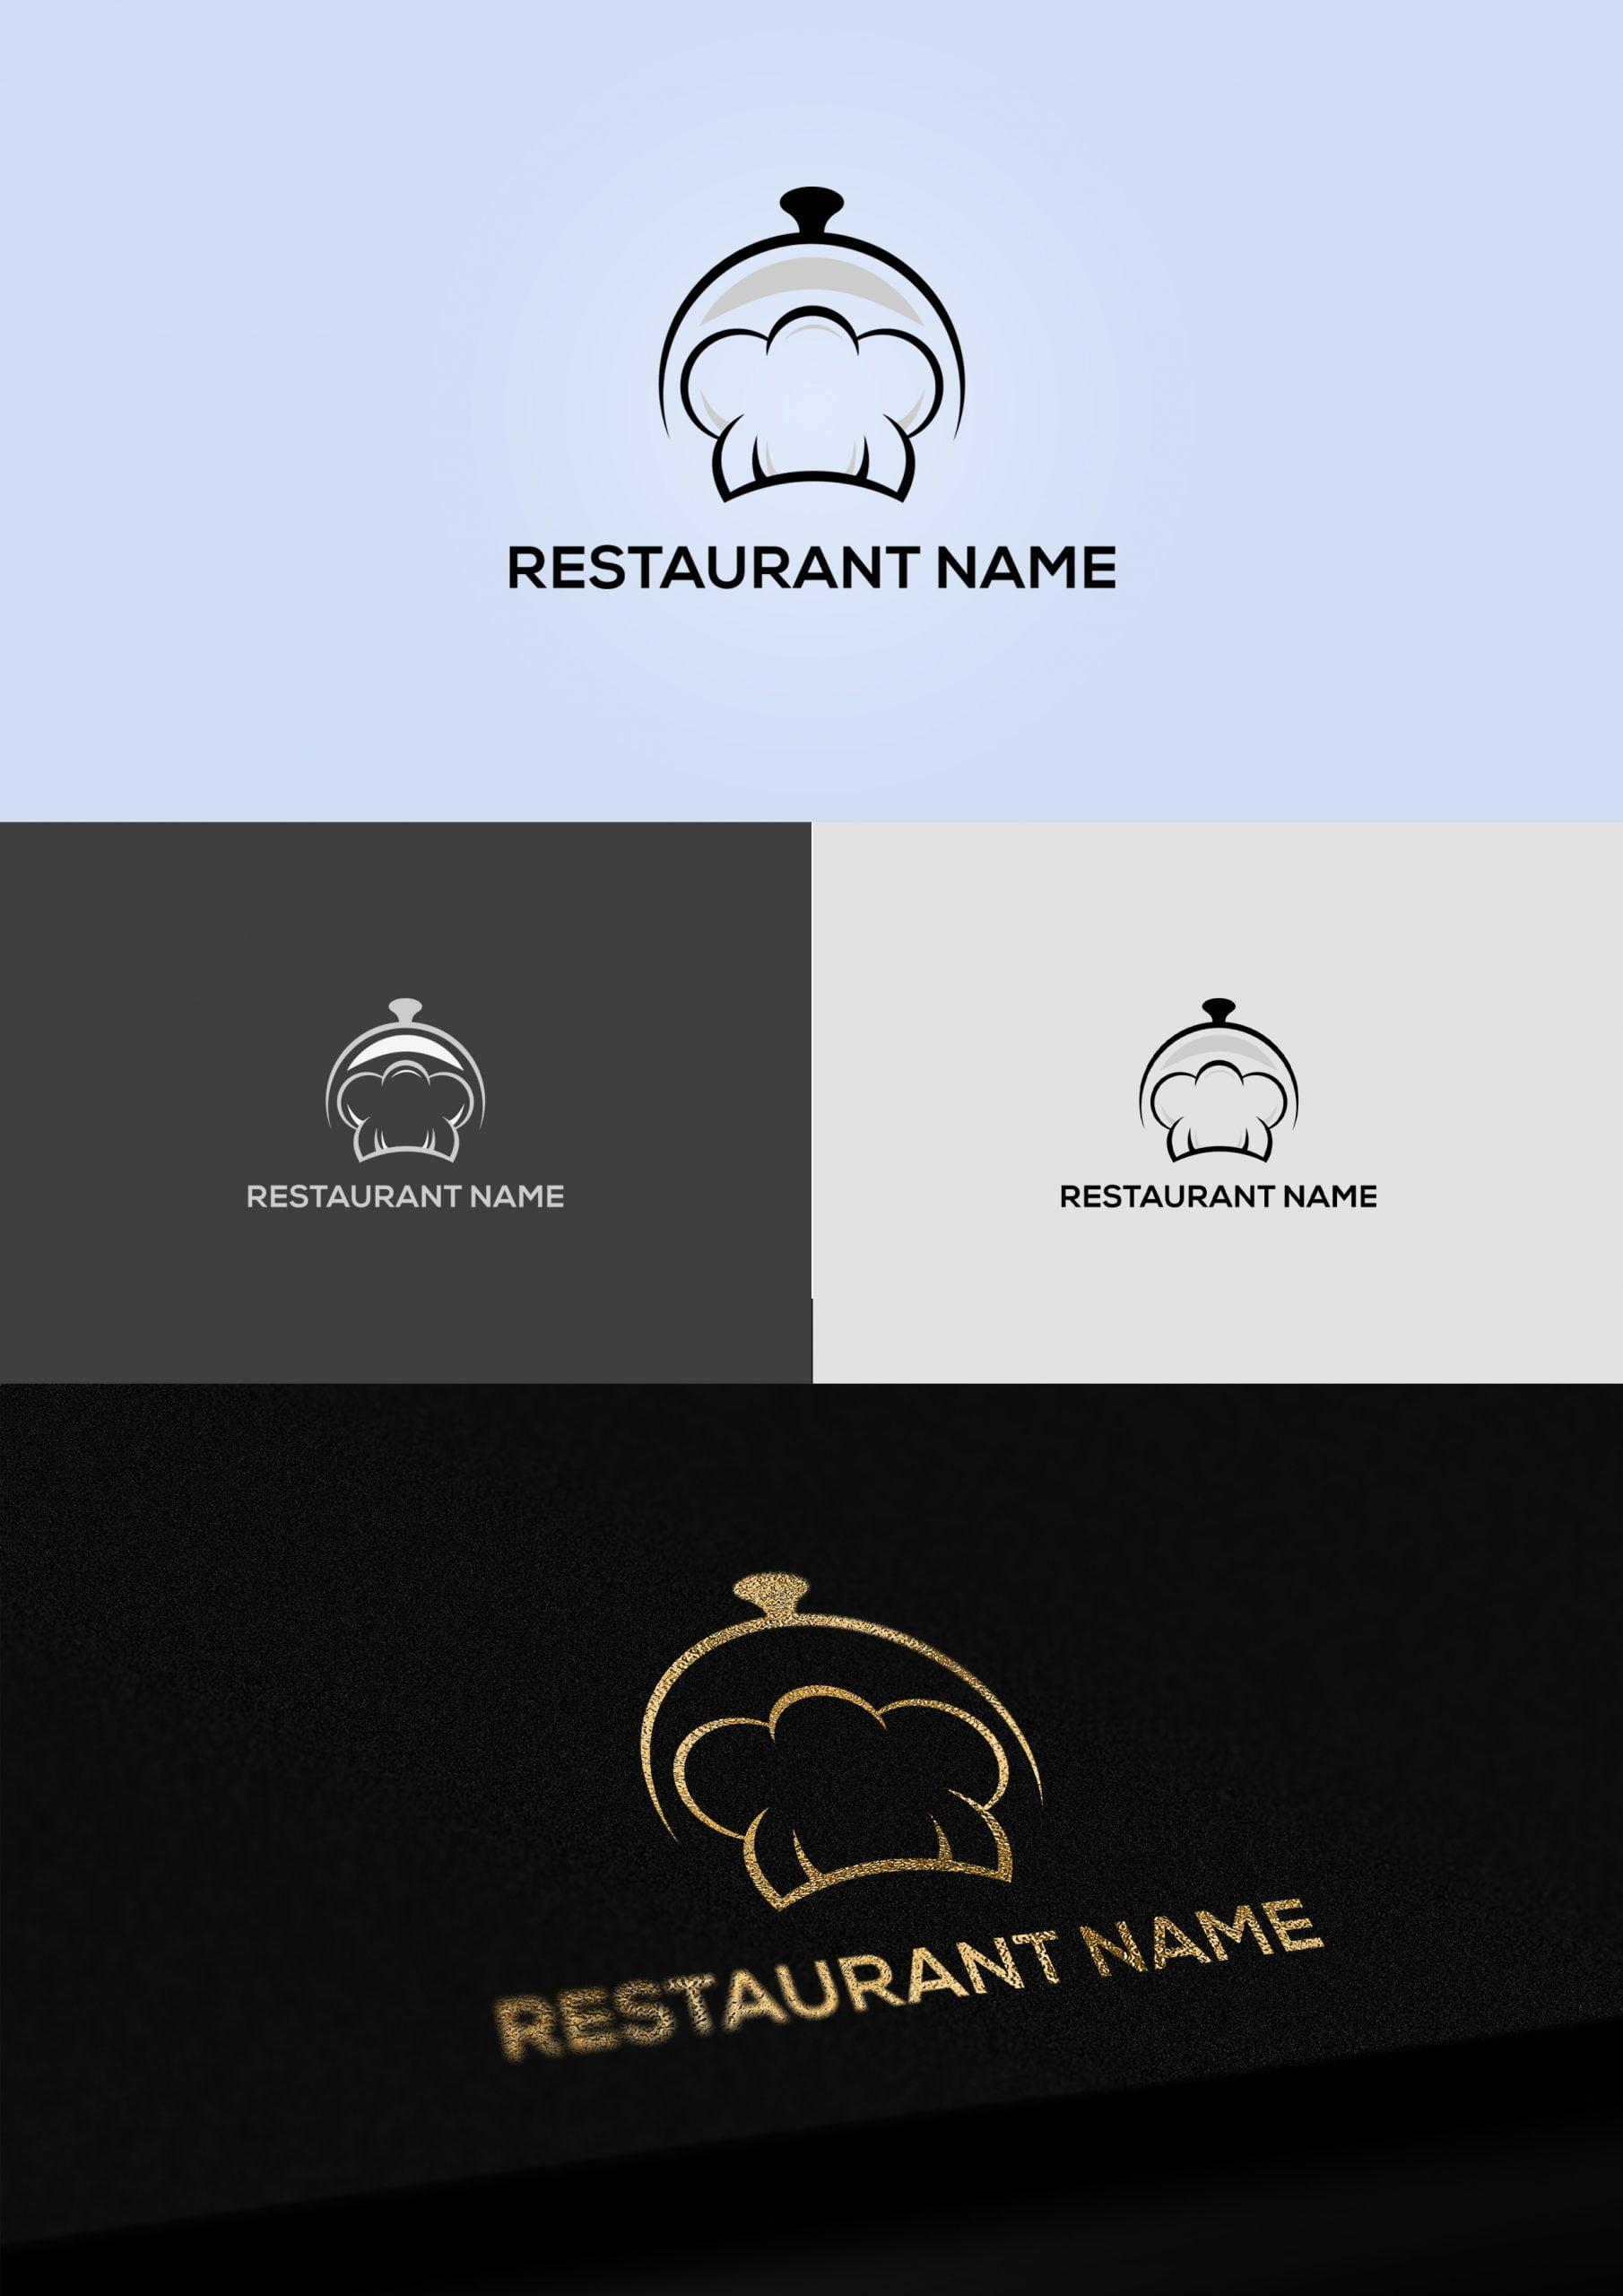 Restaurant Chef Logo Design Template Download